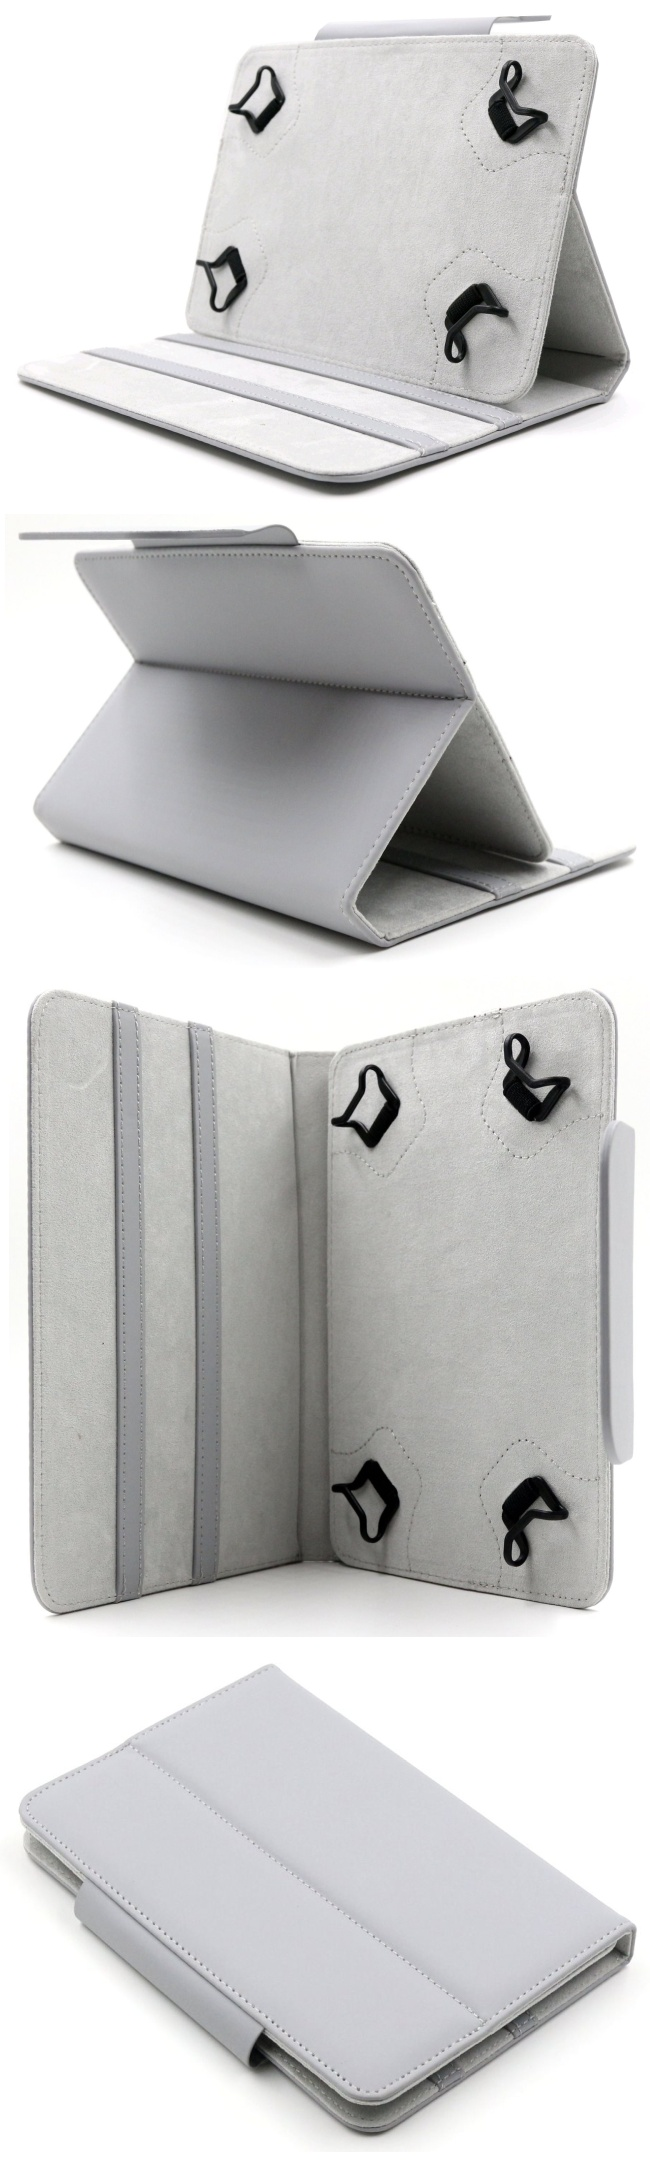 Puzdro C-tech Protect pre V� tablet, L, Black